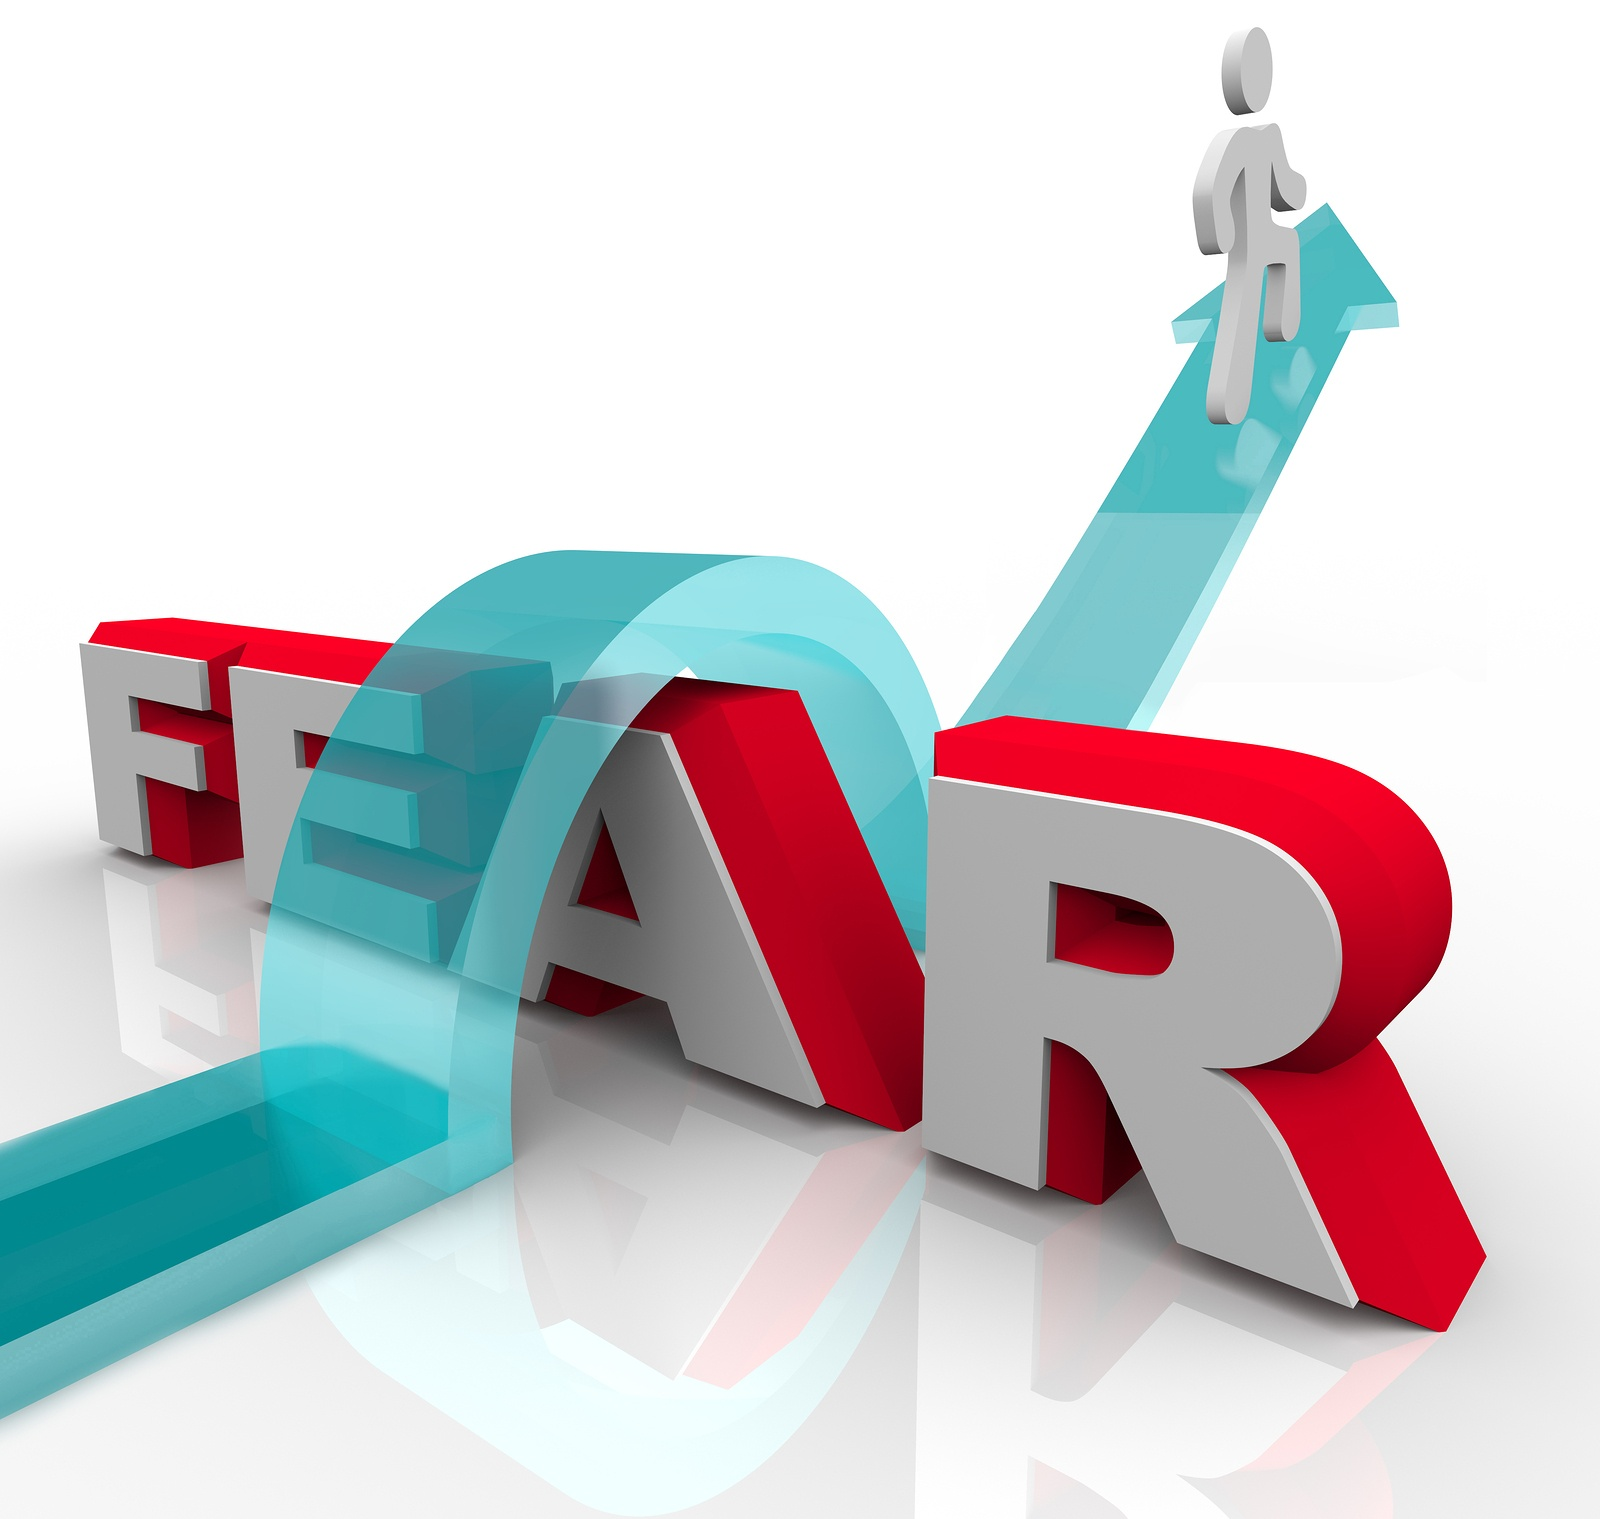 A-man-jumps-over-the-word-fear.jpg